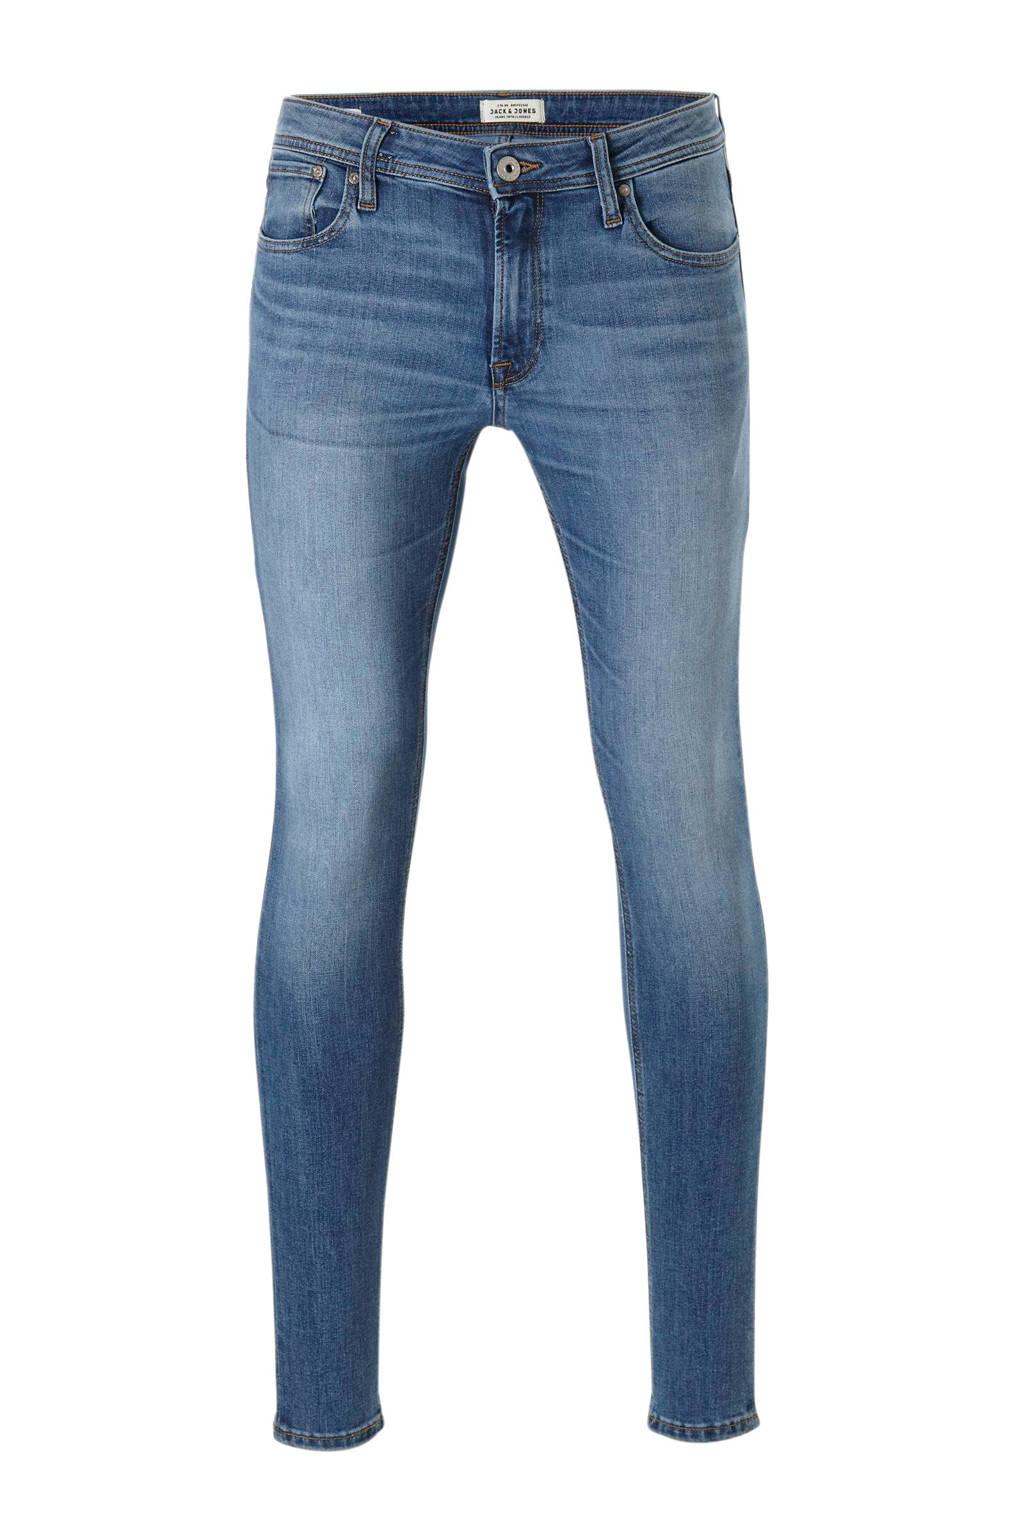 Jack & Jones Originals  skinny skinny fit jeans Tom, Light denim